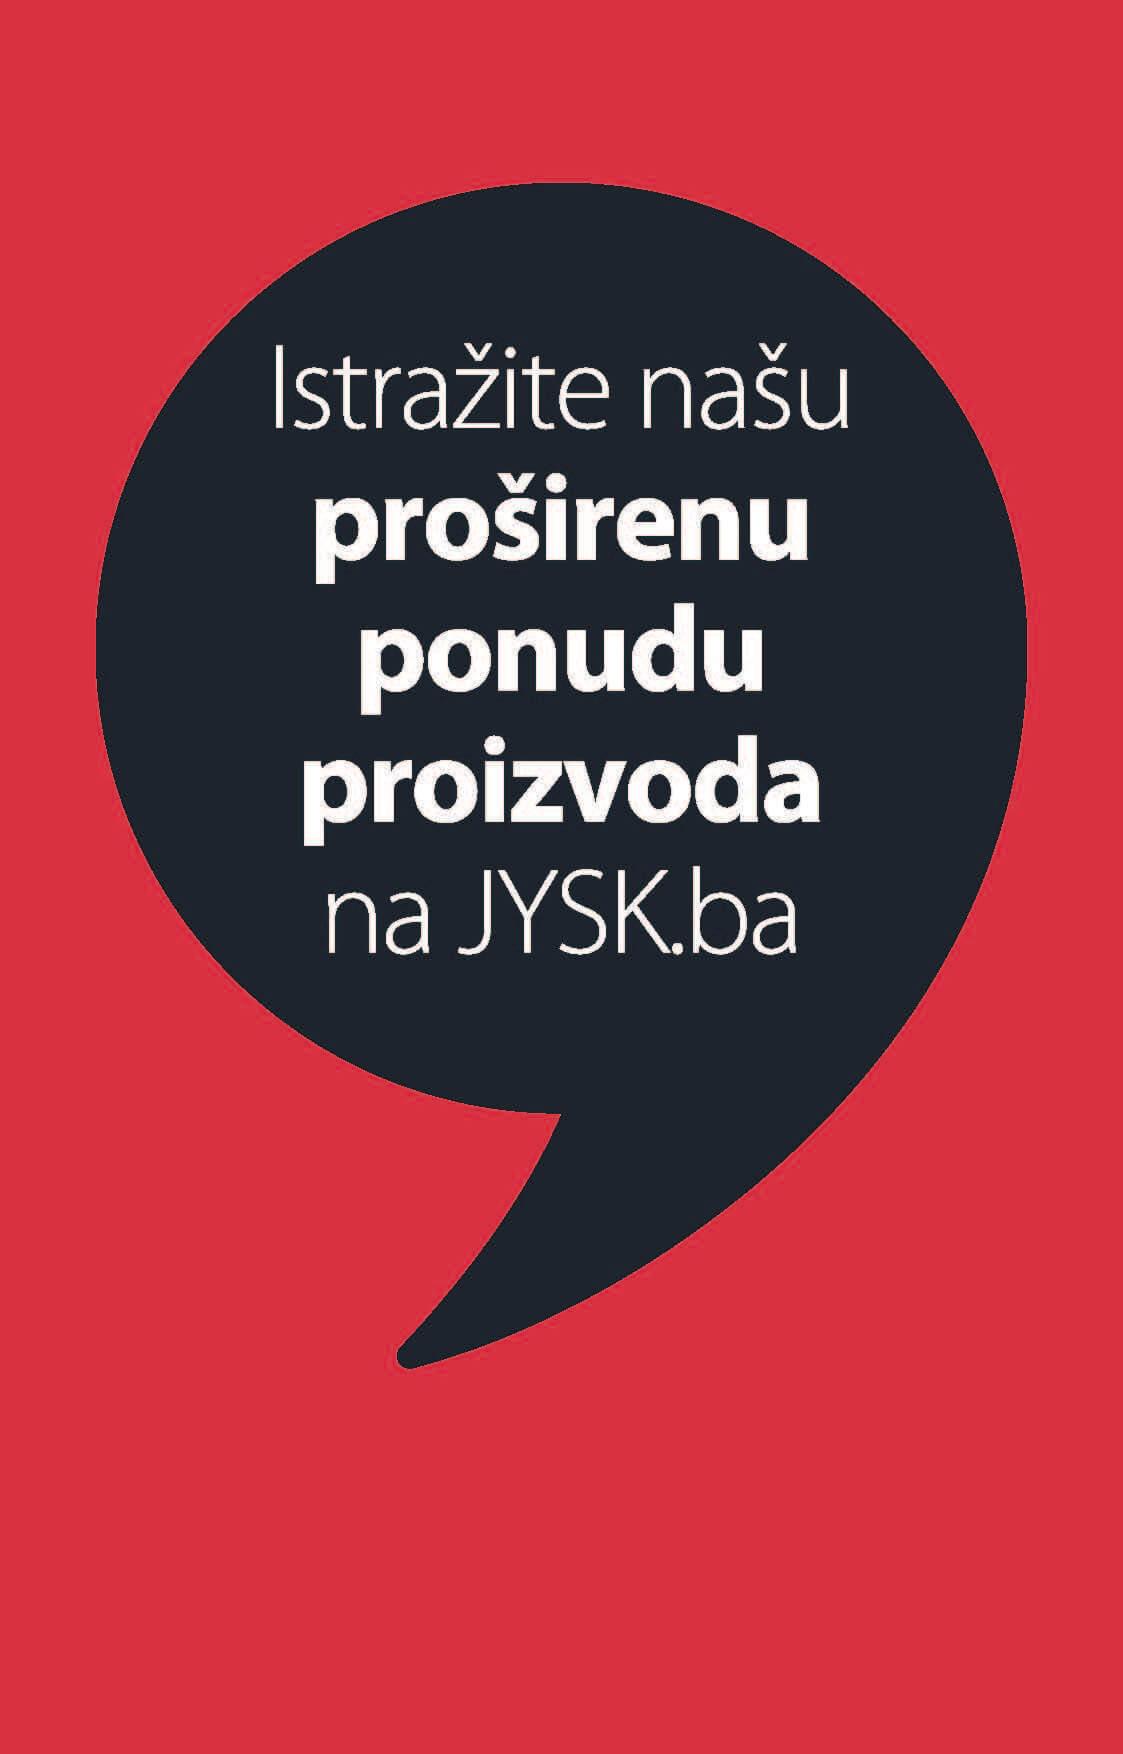 JYSK Katalog Ljetna Akcija JUL 2021 1.7.2021. 14.7.2021 ekatalozi.com Page 01